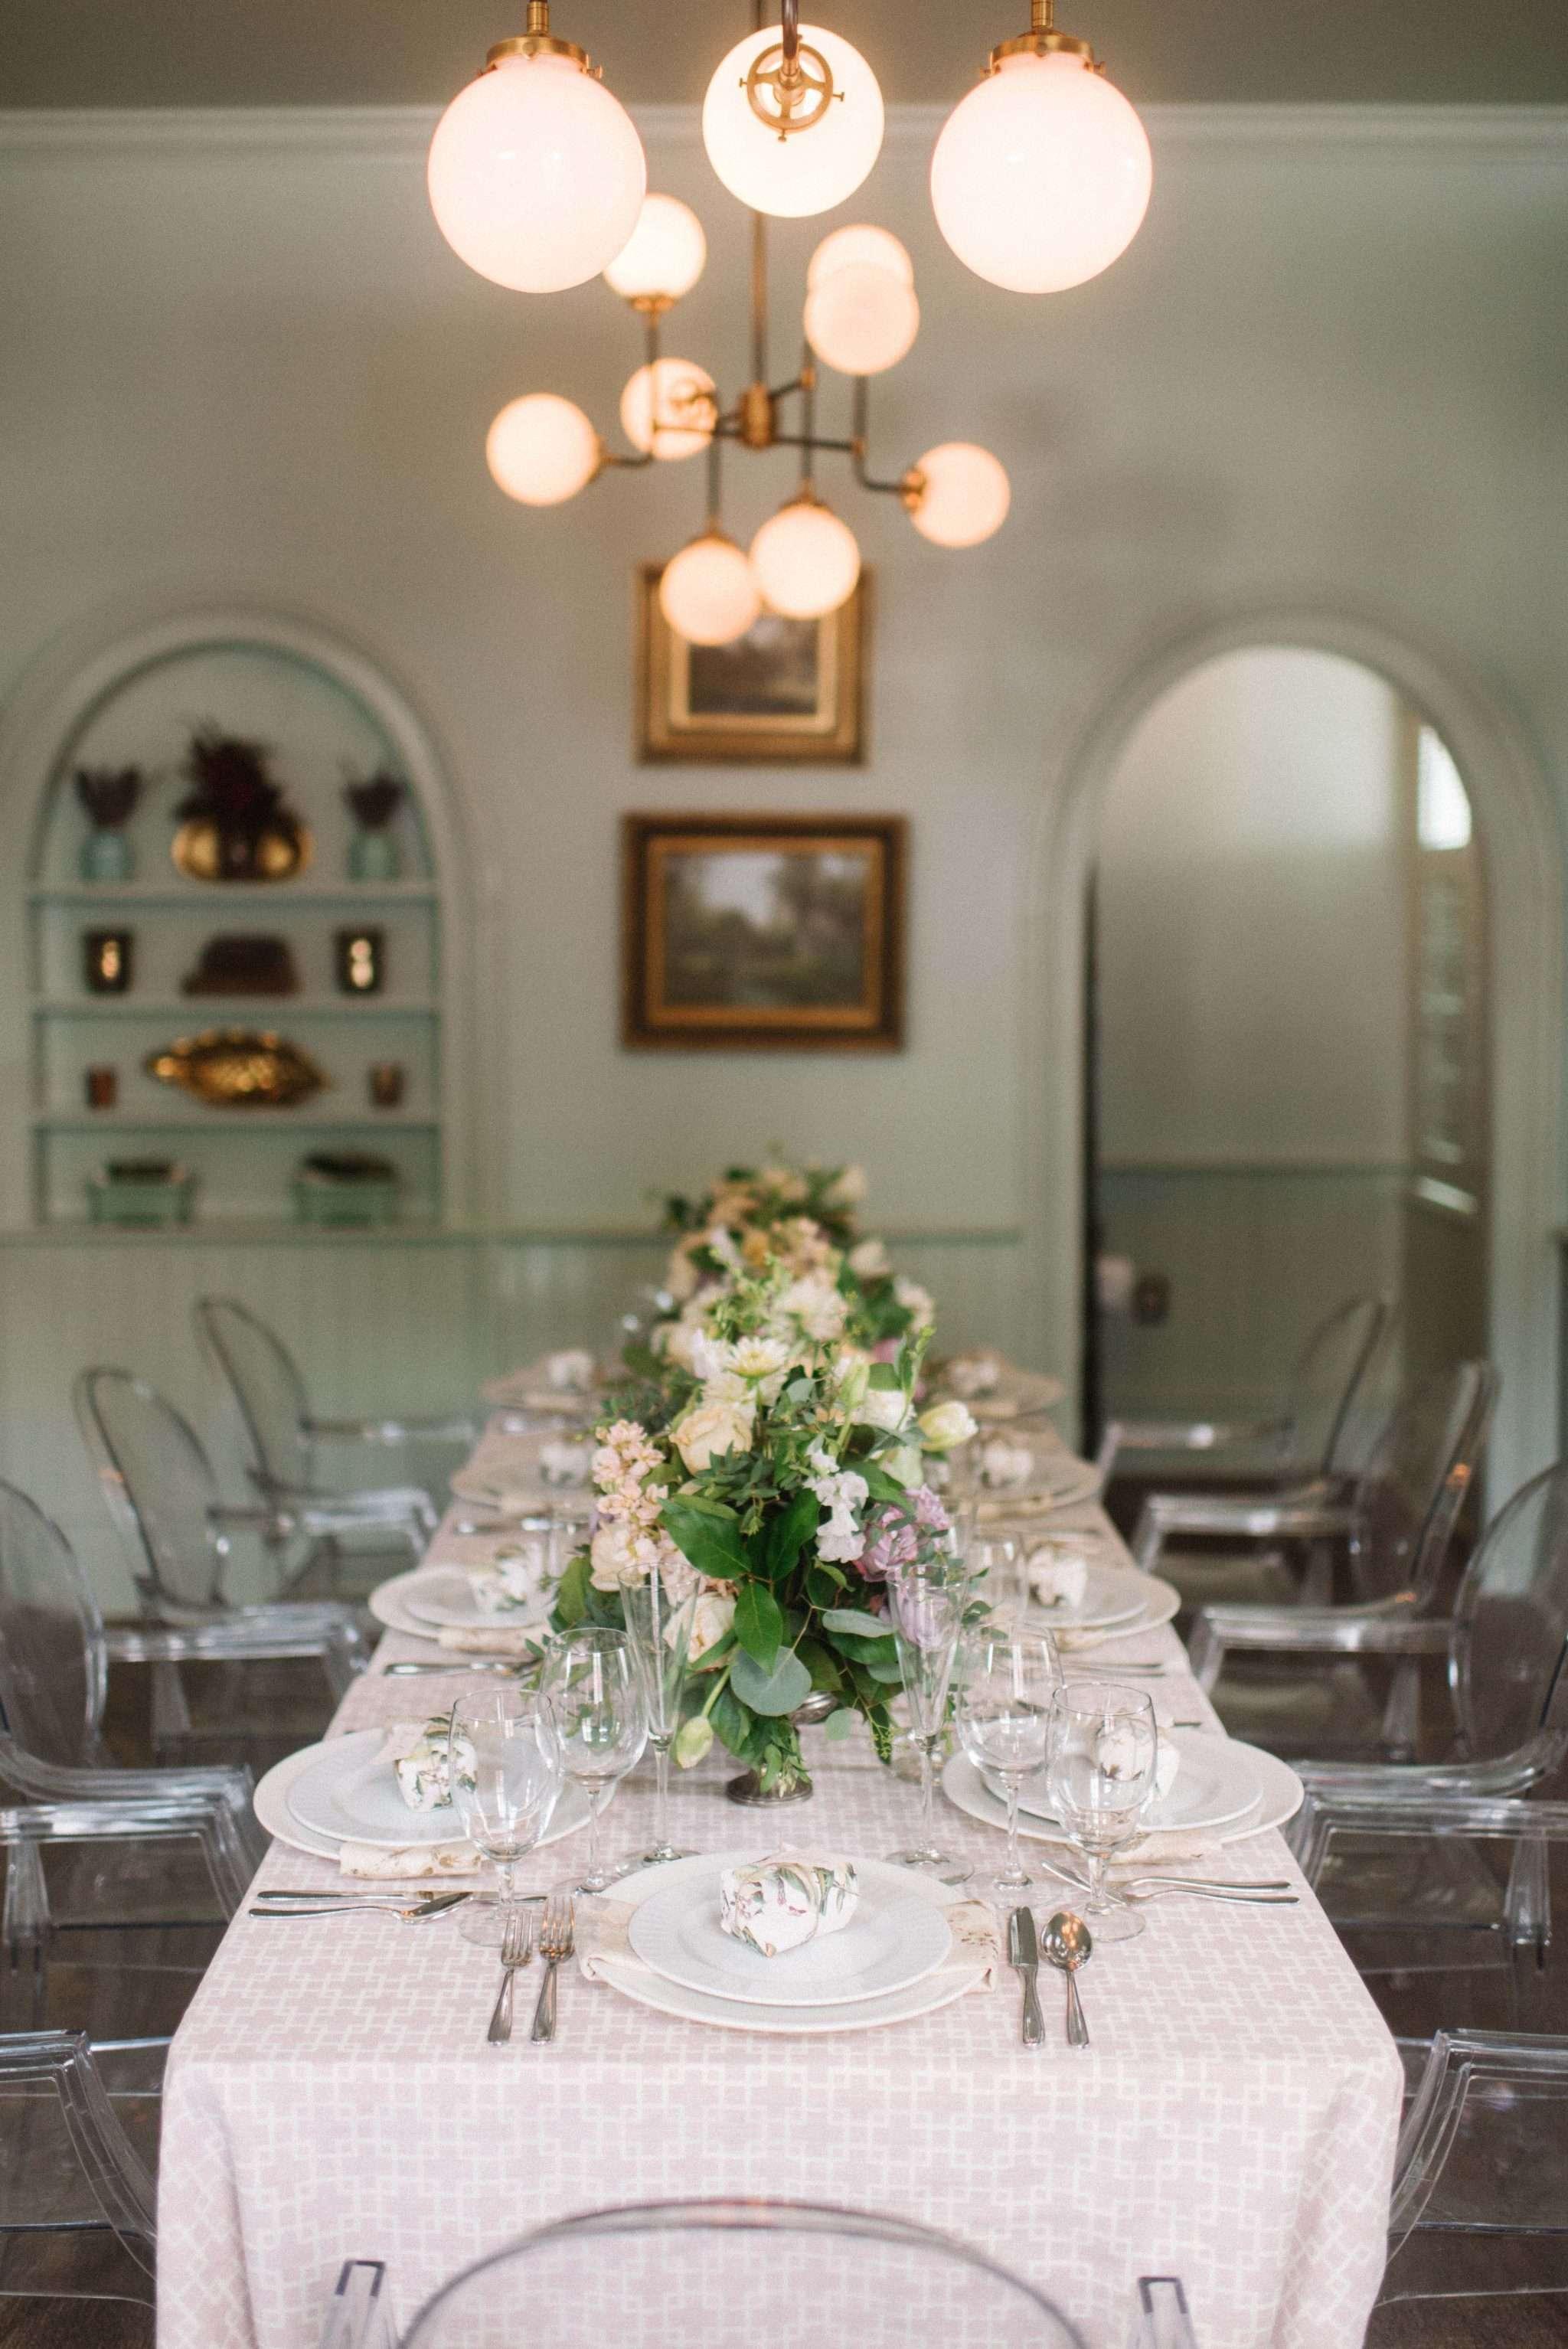 9 Tips To Make Wedding Planning Easier | Rhyme & Reason